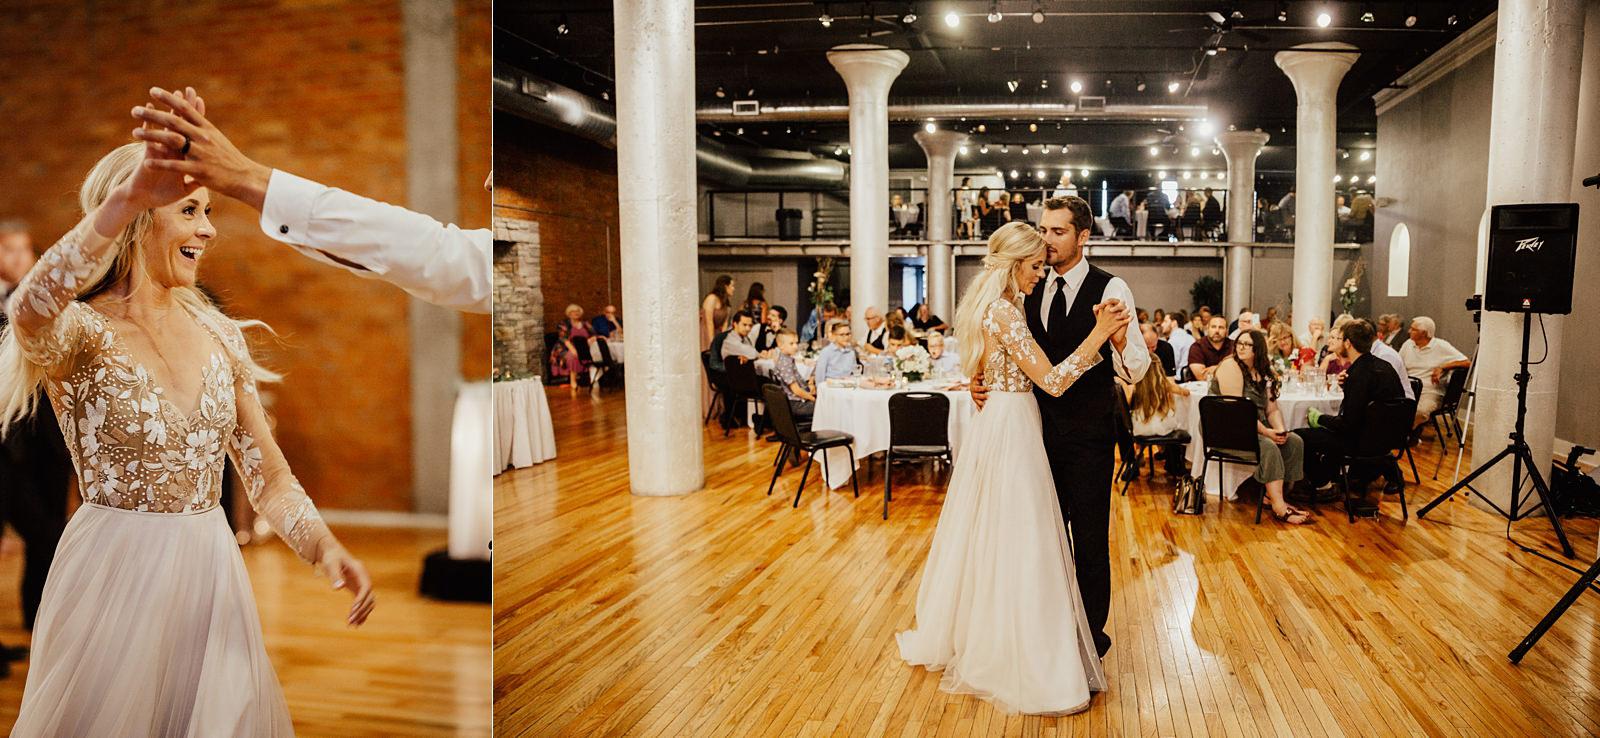 Molly & Bradley Modern Boho Wedding at The University Club Quad Cities-50.jpg